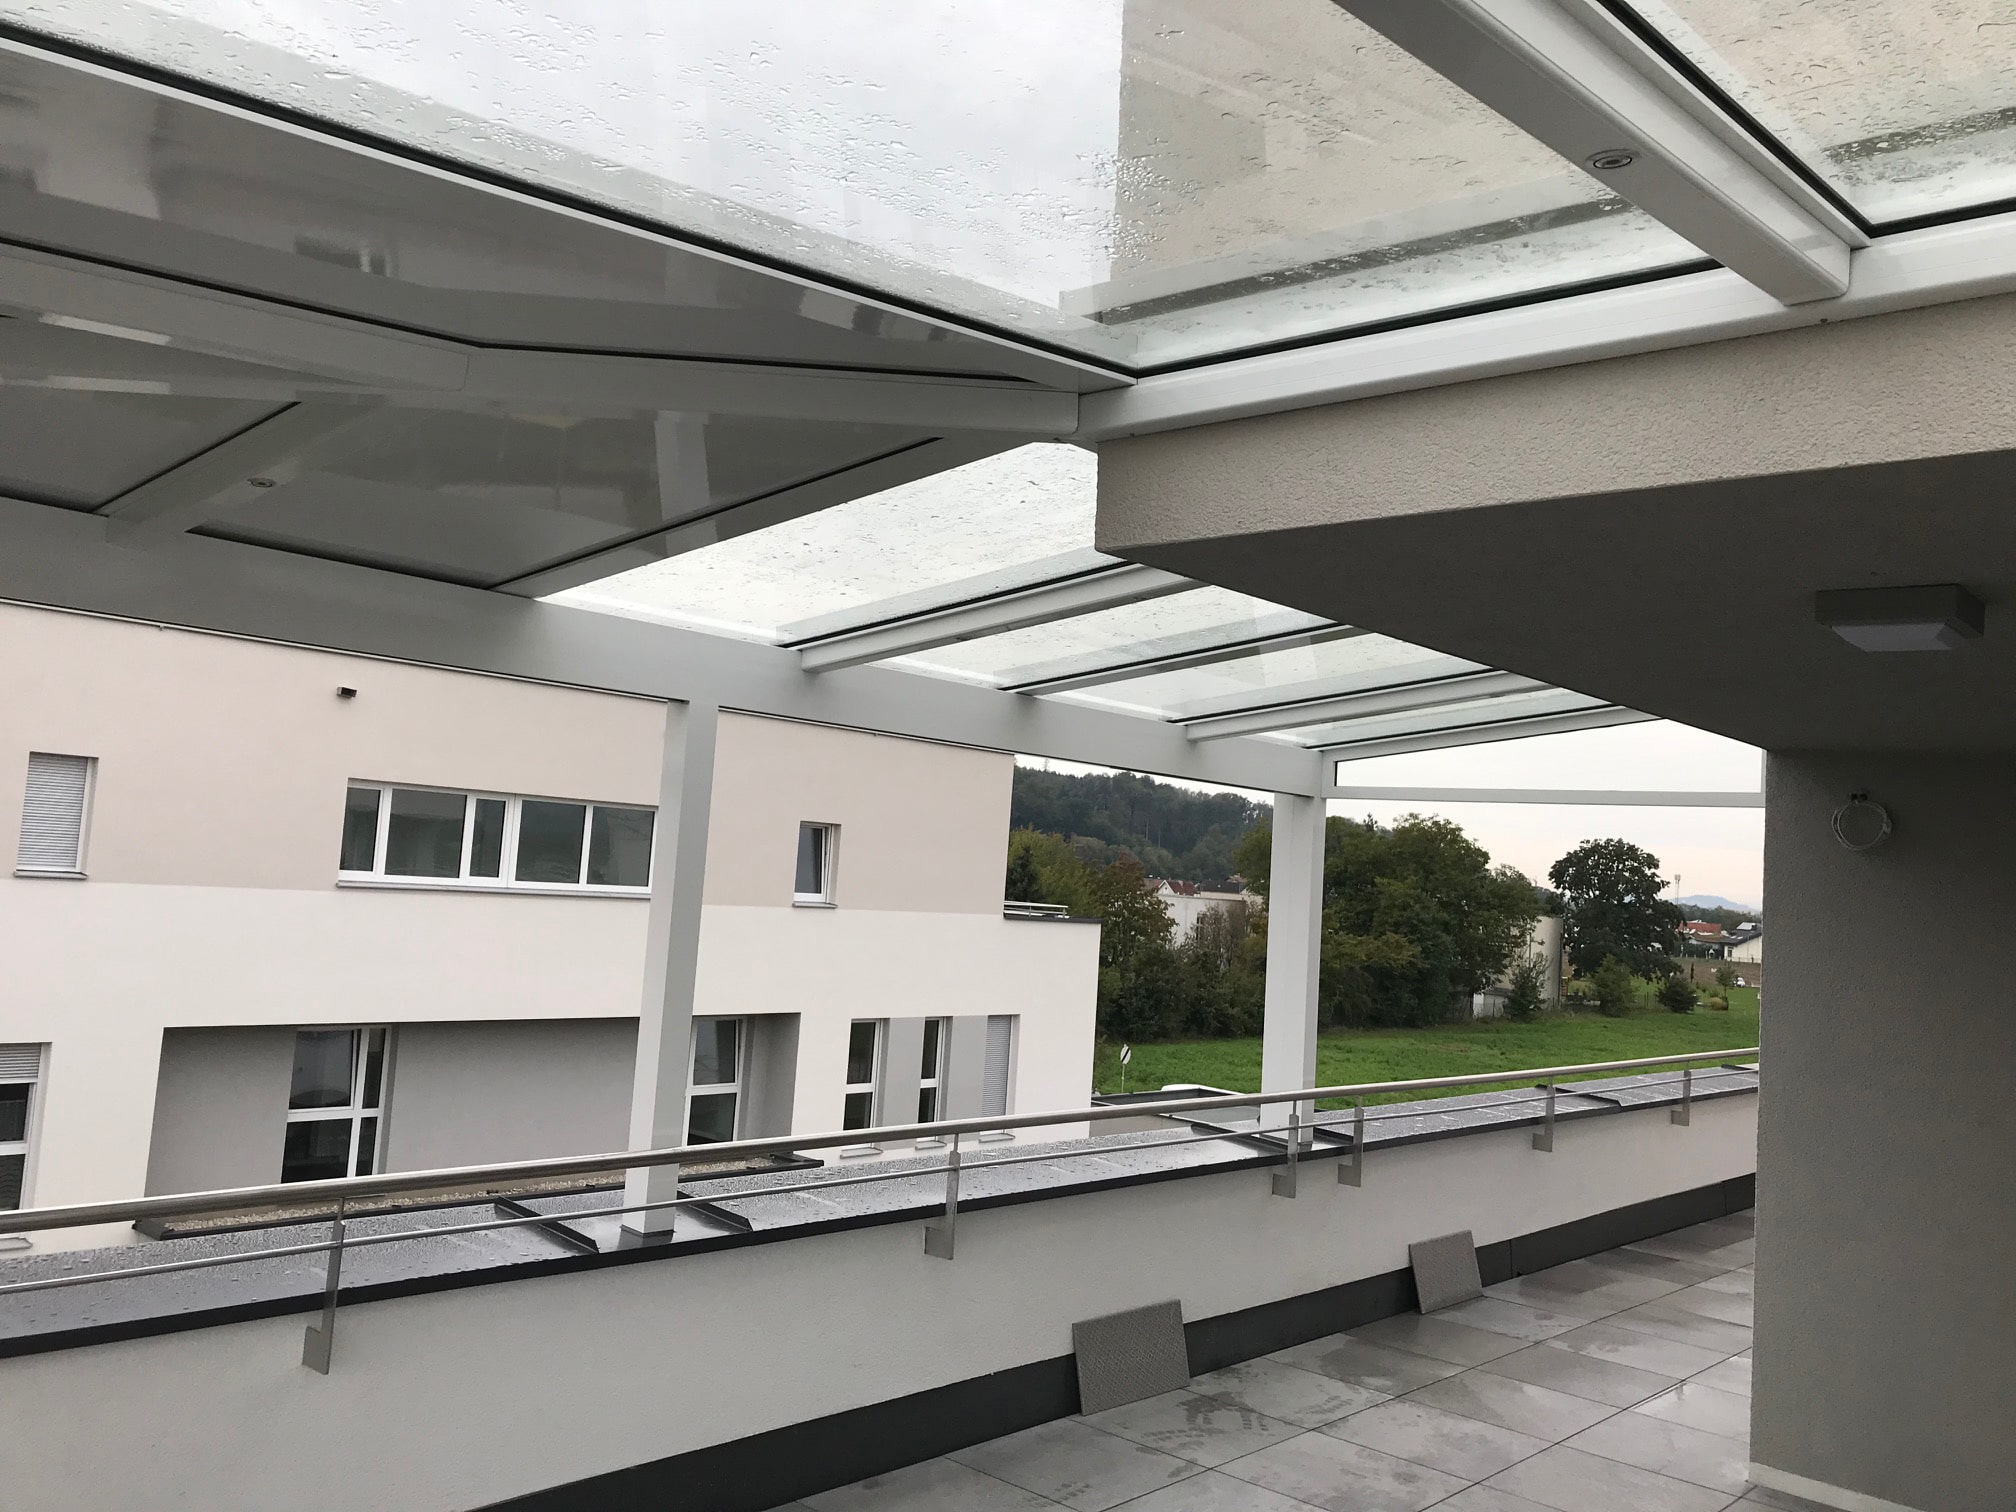 Aluminium Terrassenüberdachung für Penthouse in Linz